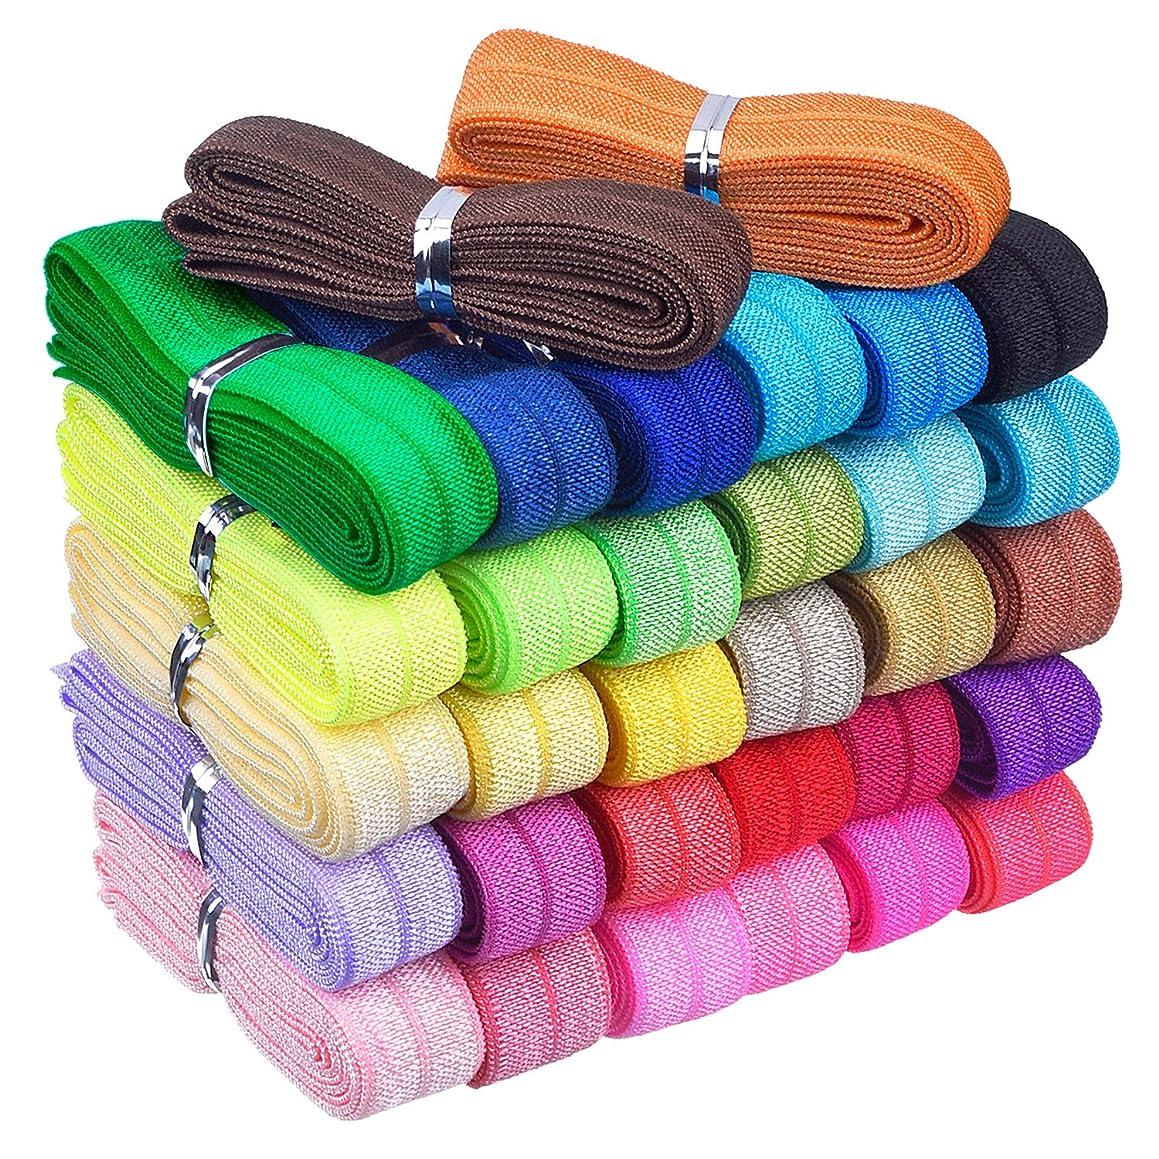 Mudder 32 Yards Ribbon Elastic Foldover Elastics Stretch Hair Ties Headbands for Baby Girls Hair Bow, 32 Colors, 1 Yard Each One